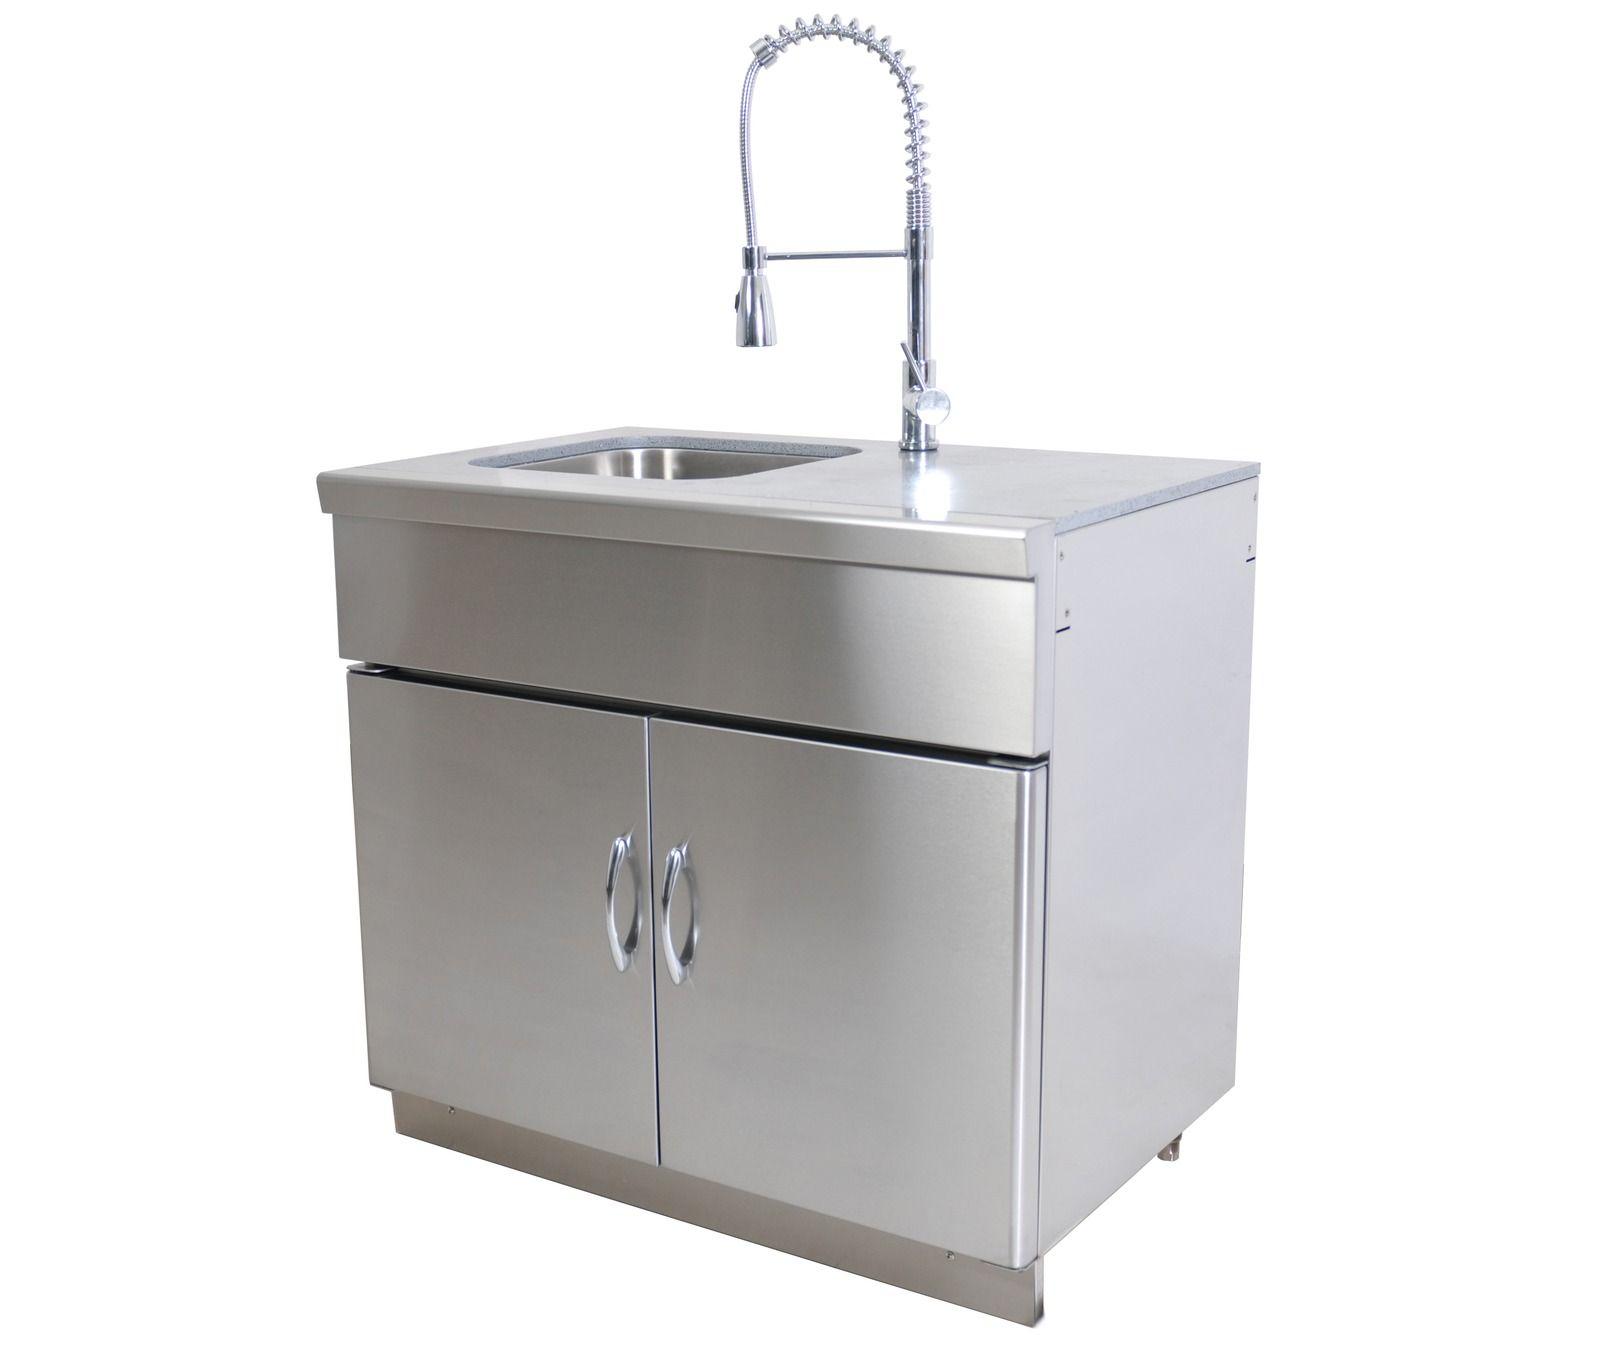 Outdoor Kitchen Sink Unit Grandfire Outdoor Kitchen Sink Kitchen Sink Units Custom Kitchen Cabinets